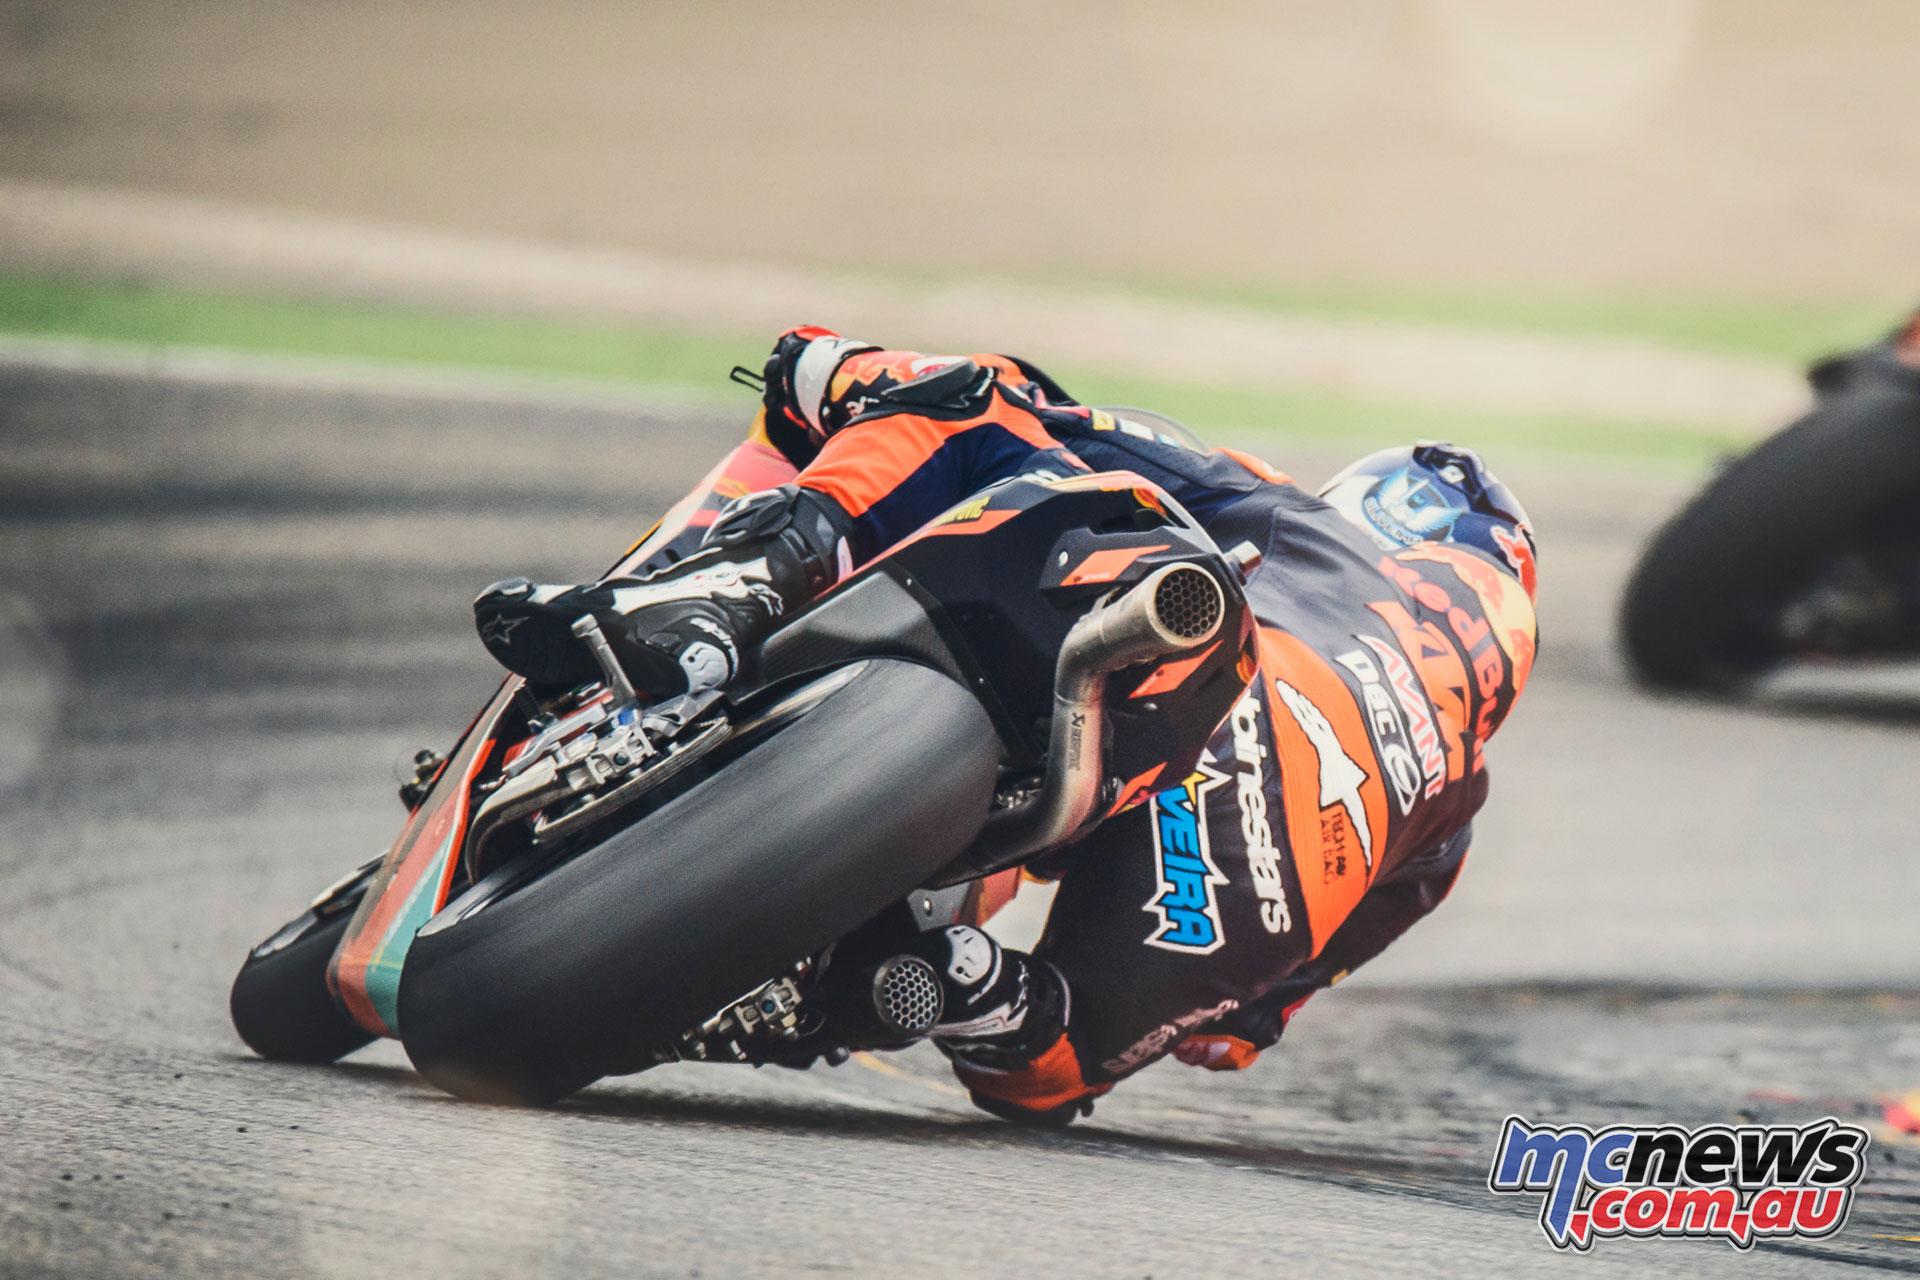 Ktm Motogp Factory Racing Positive After Spanish Test